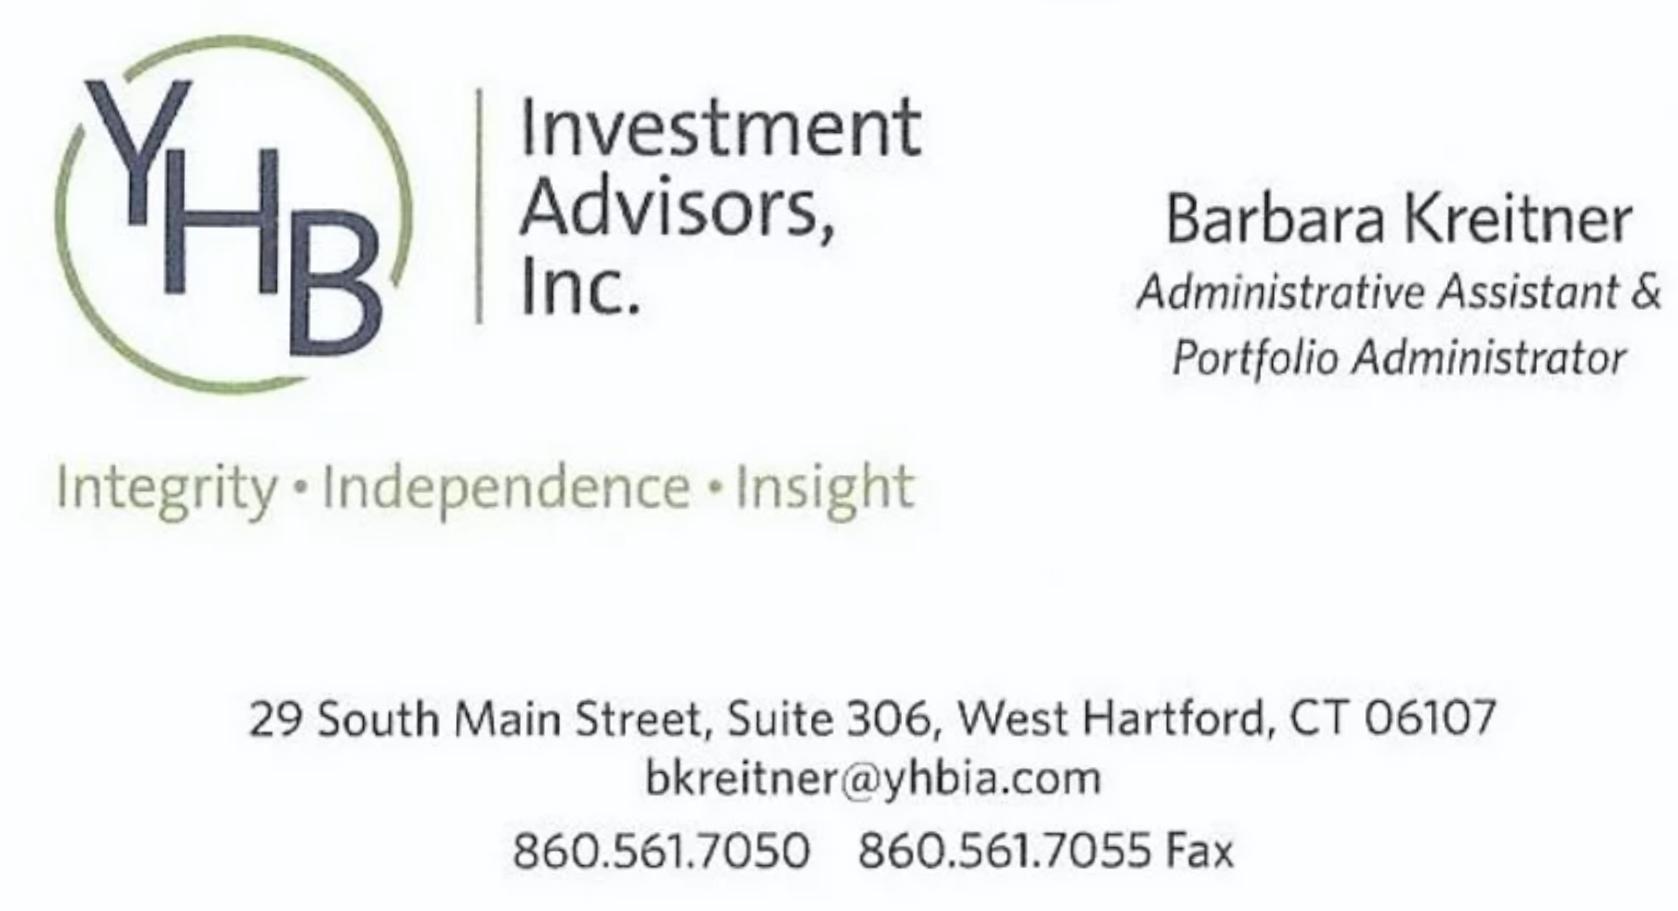 YHB Investment Advisors